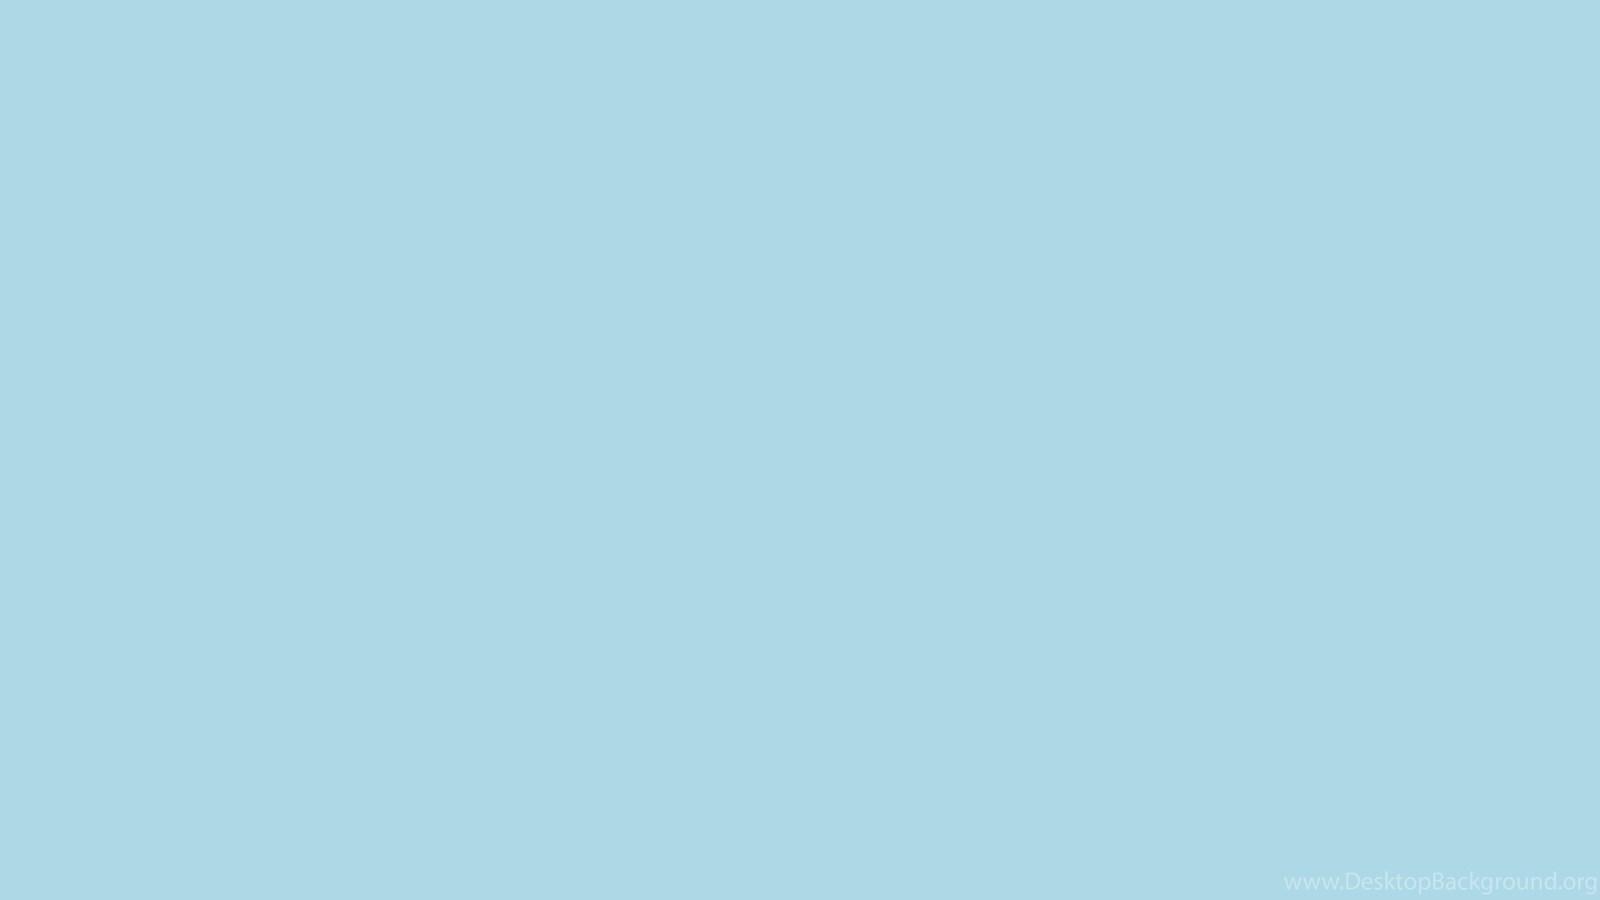 how to change desktop background color